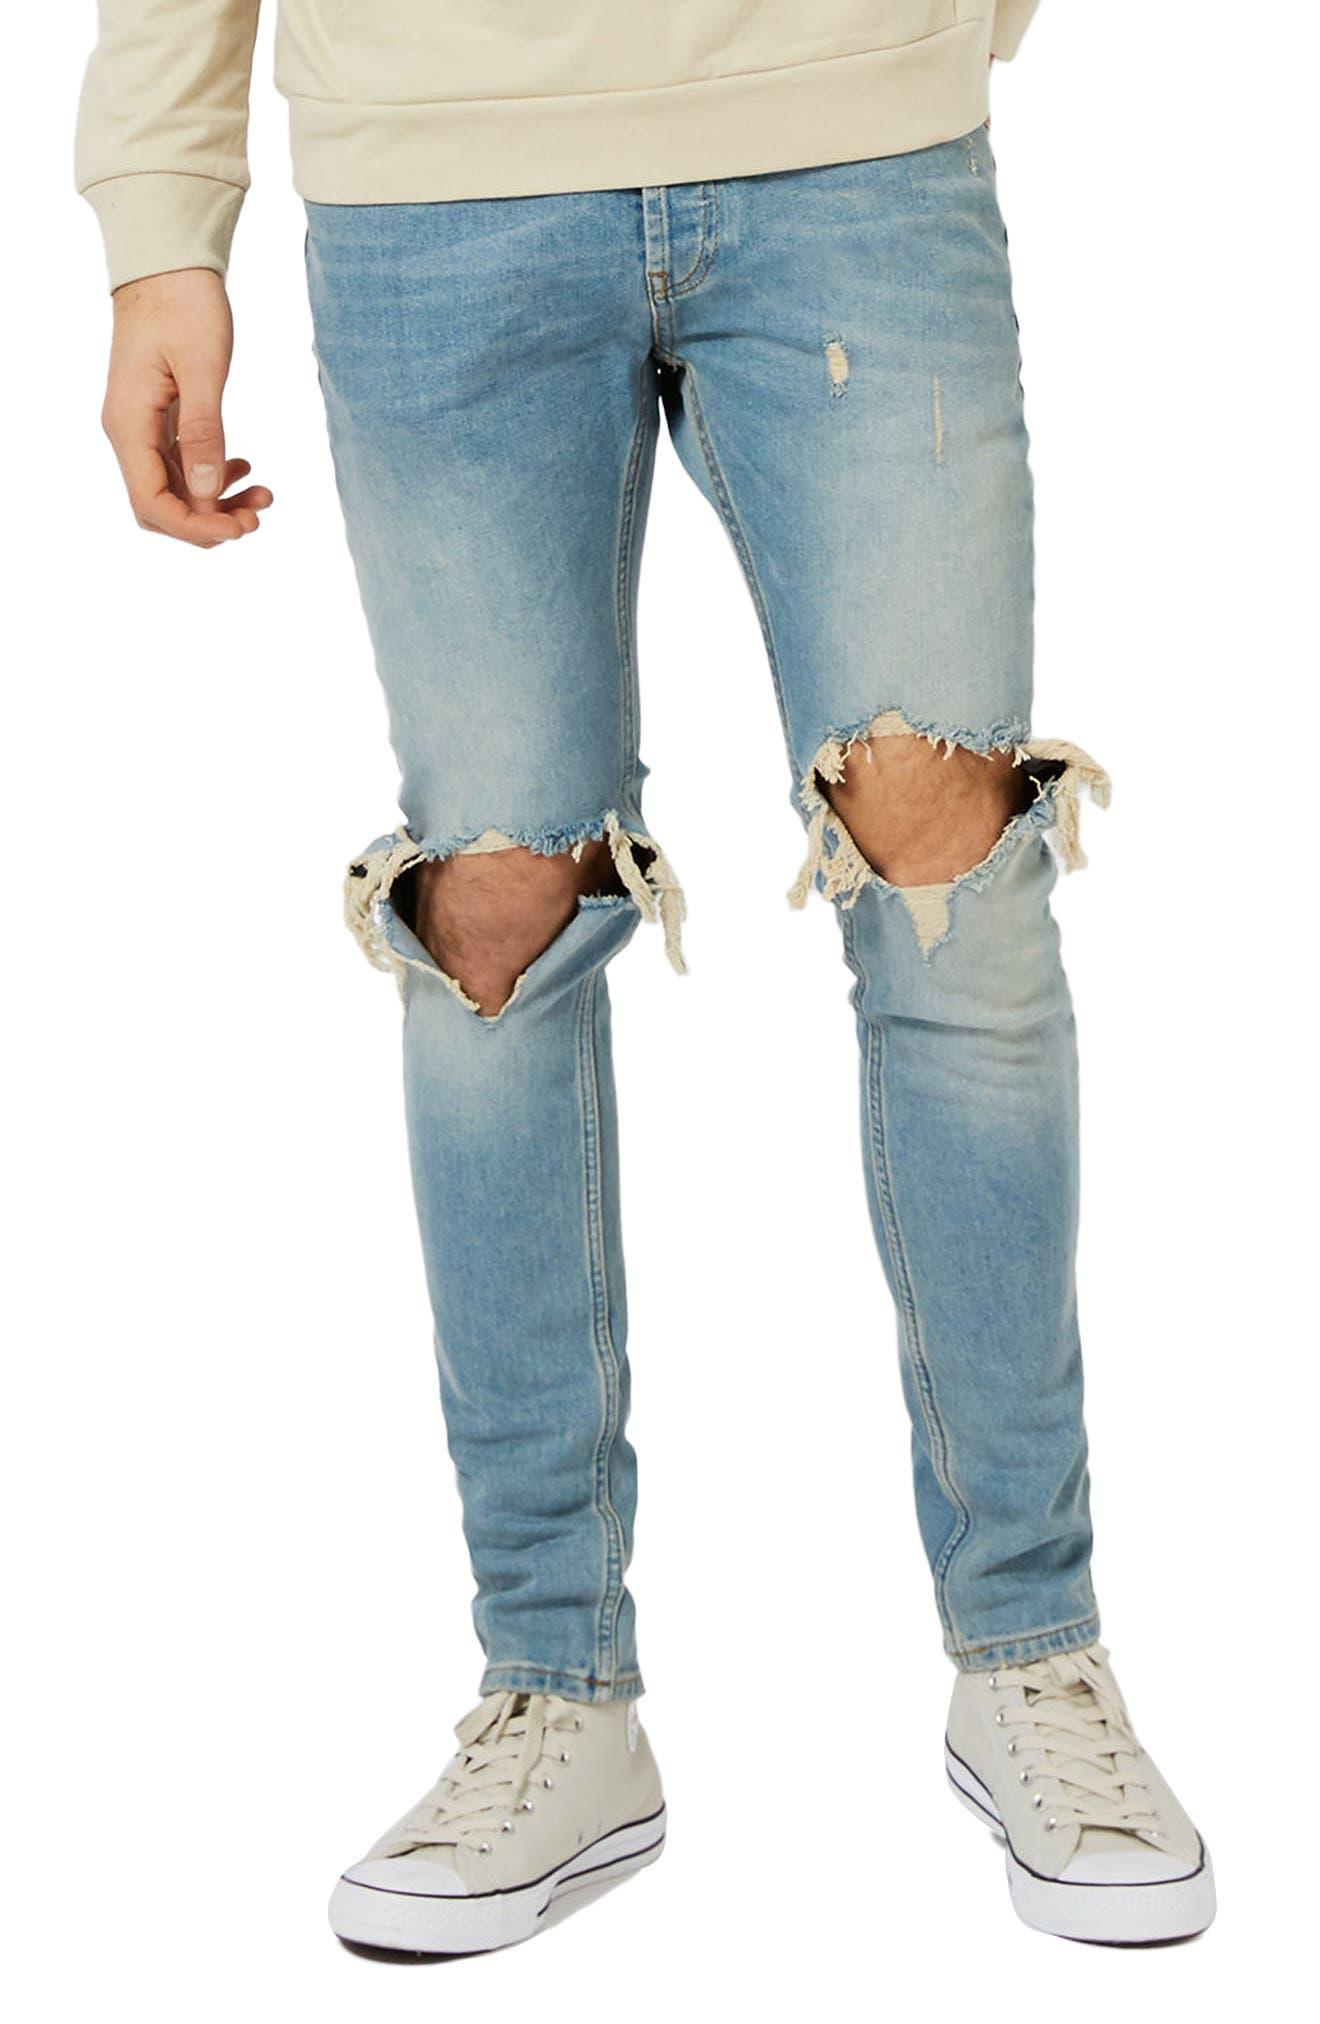 Mens jeans design legends jeans - Men S Distressed Jeans Relaxed Bootcut Fit Selvedge Denim Nordstrom